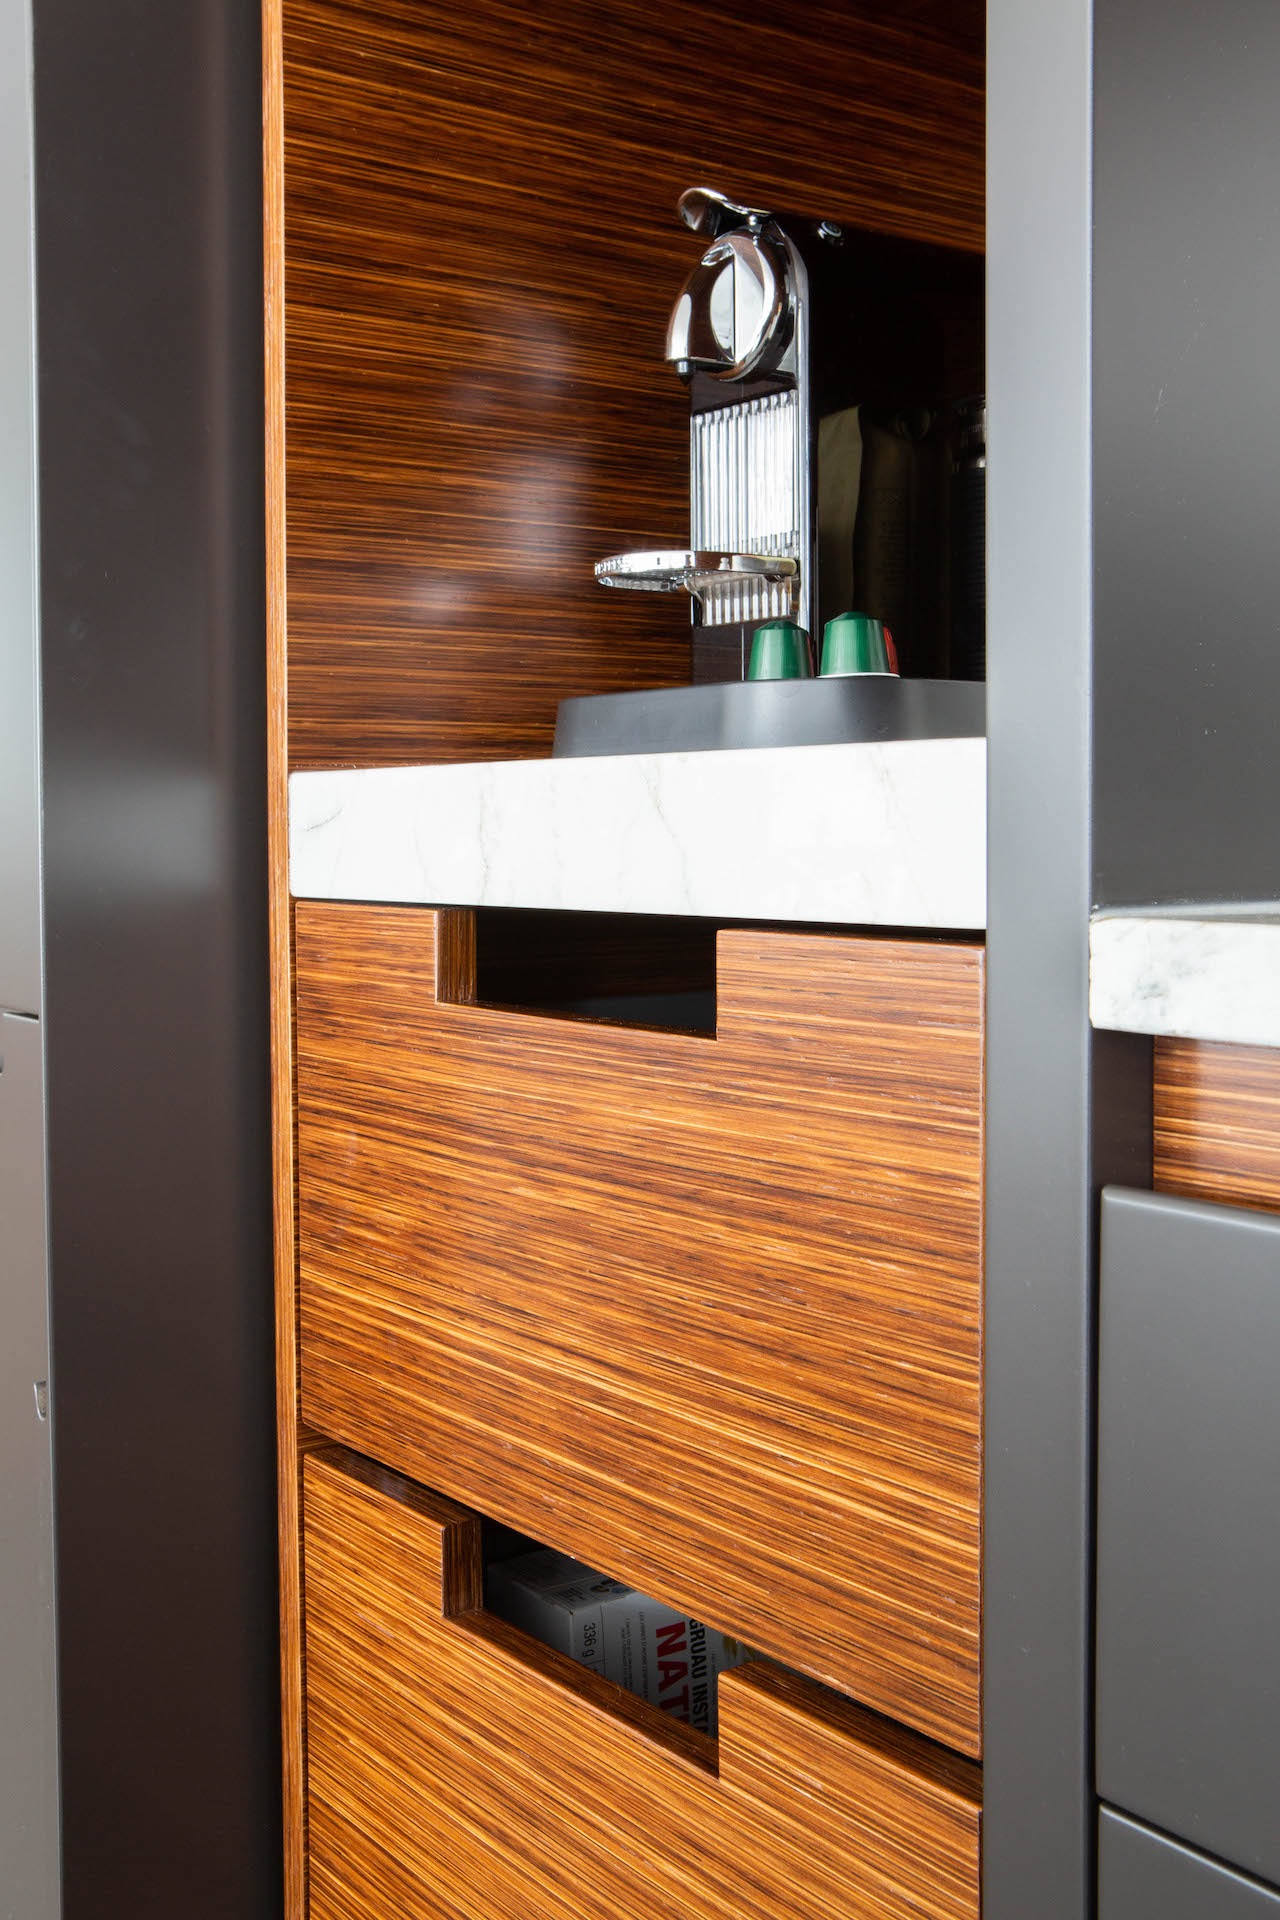 Wood drawers with espresso machine